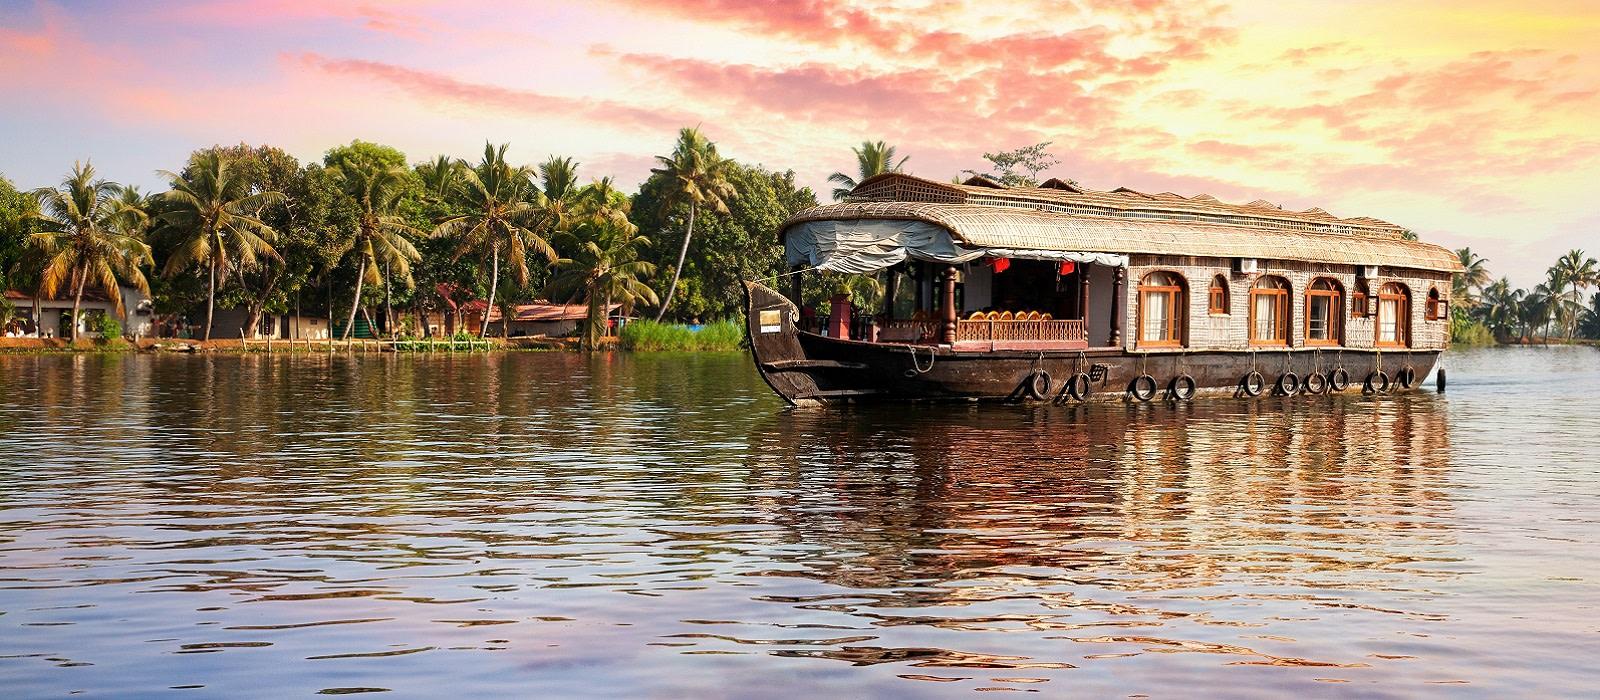 Enchanting Travels Houseboat Kerala - things to do in Kerala